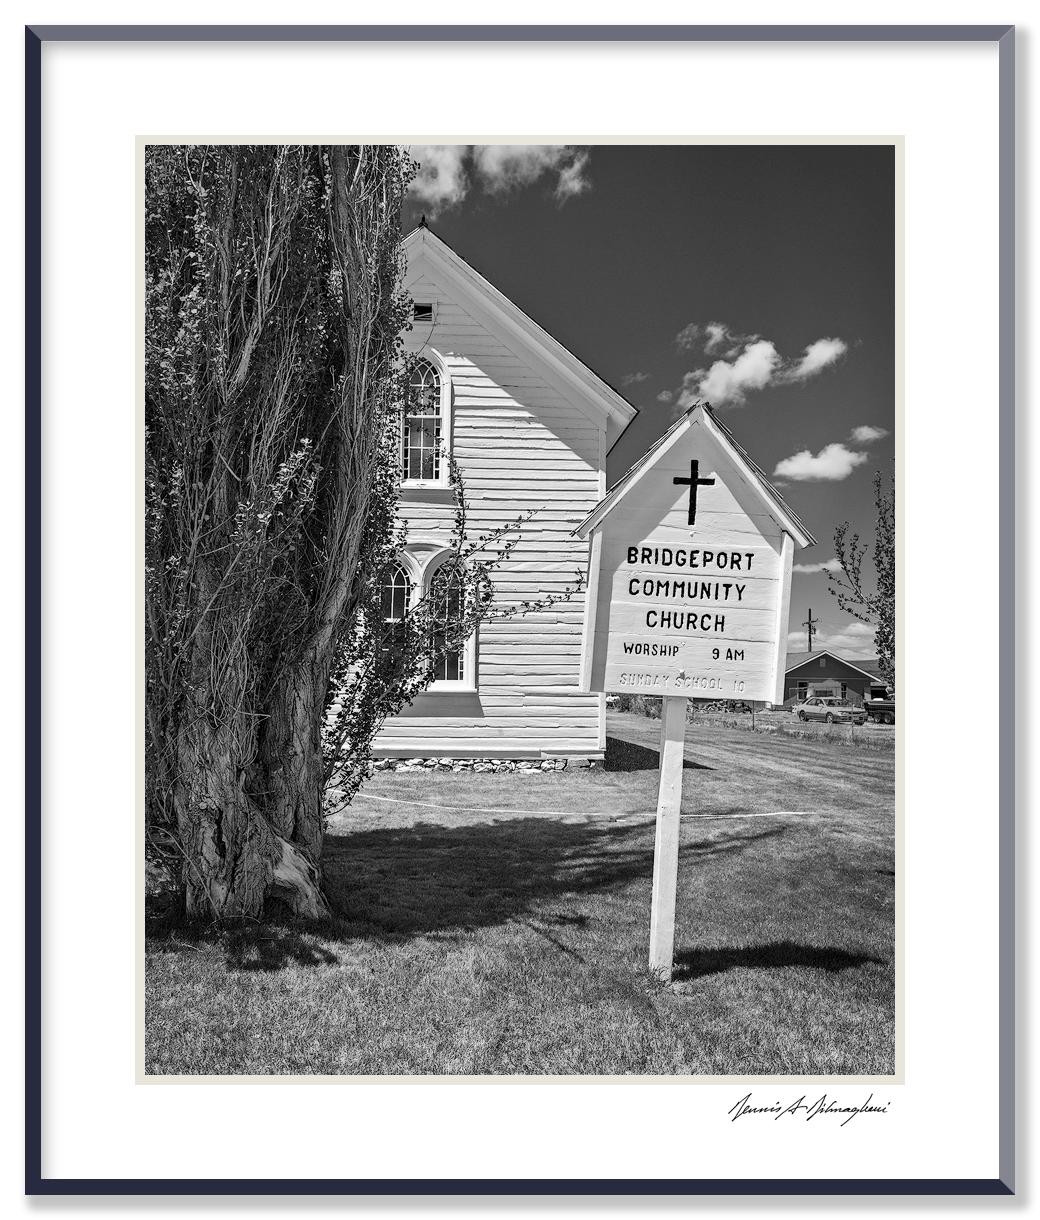 "Bridgeport Community Church - Bridgeport, California   Sign of the times - ""Sunday School 10am"" (painted over)"